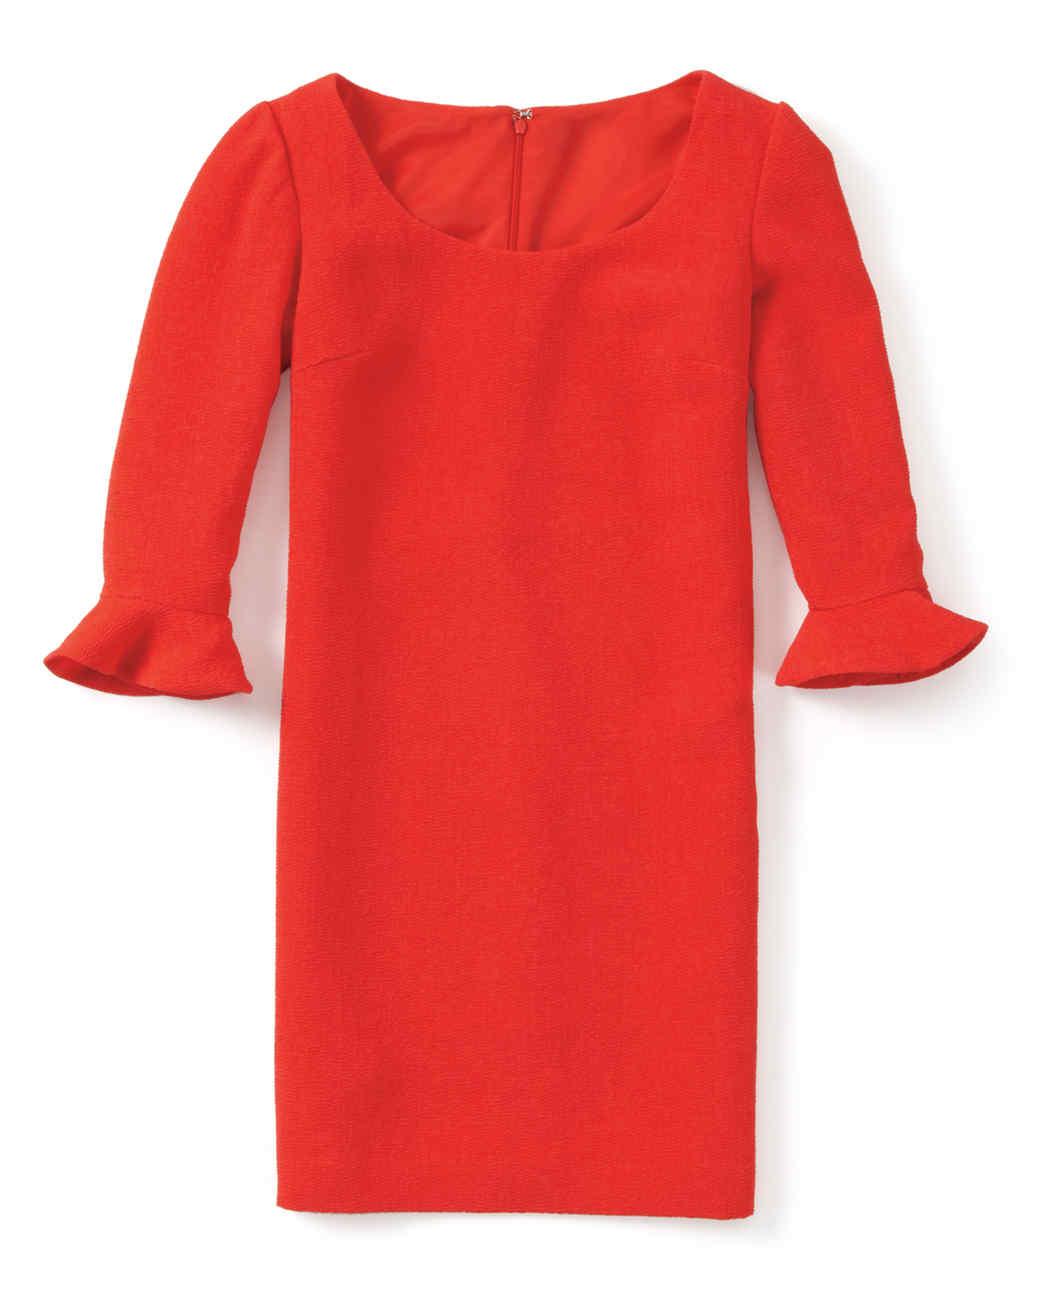 ann-taylor-dress-065-md109393.jpg